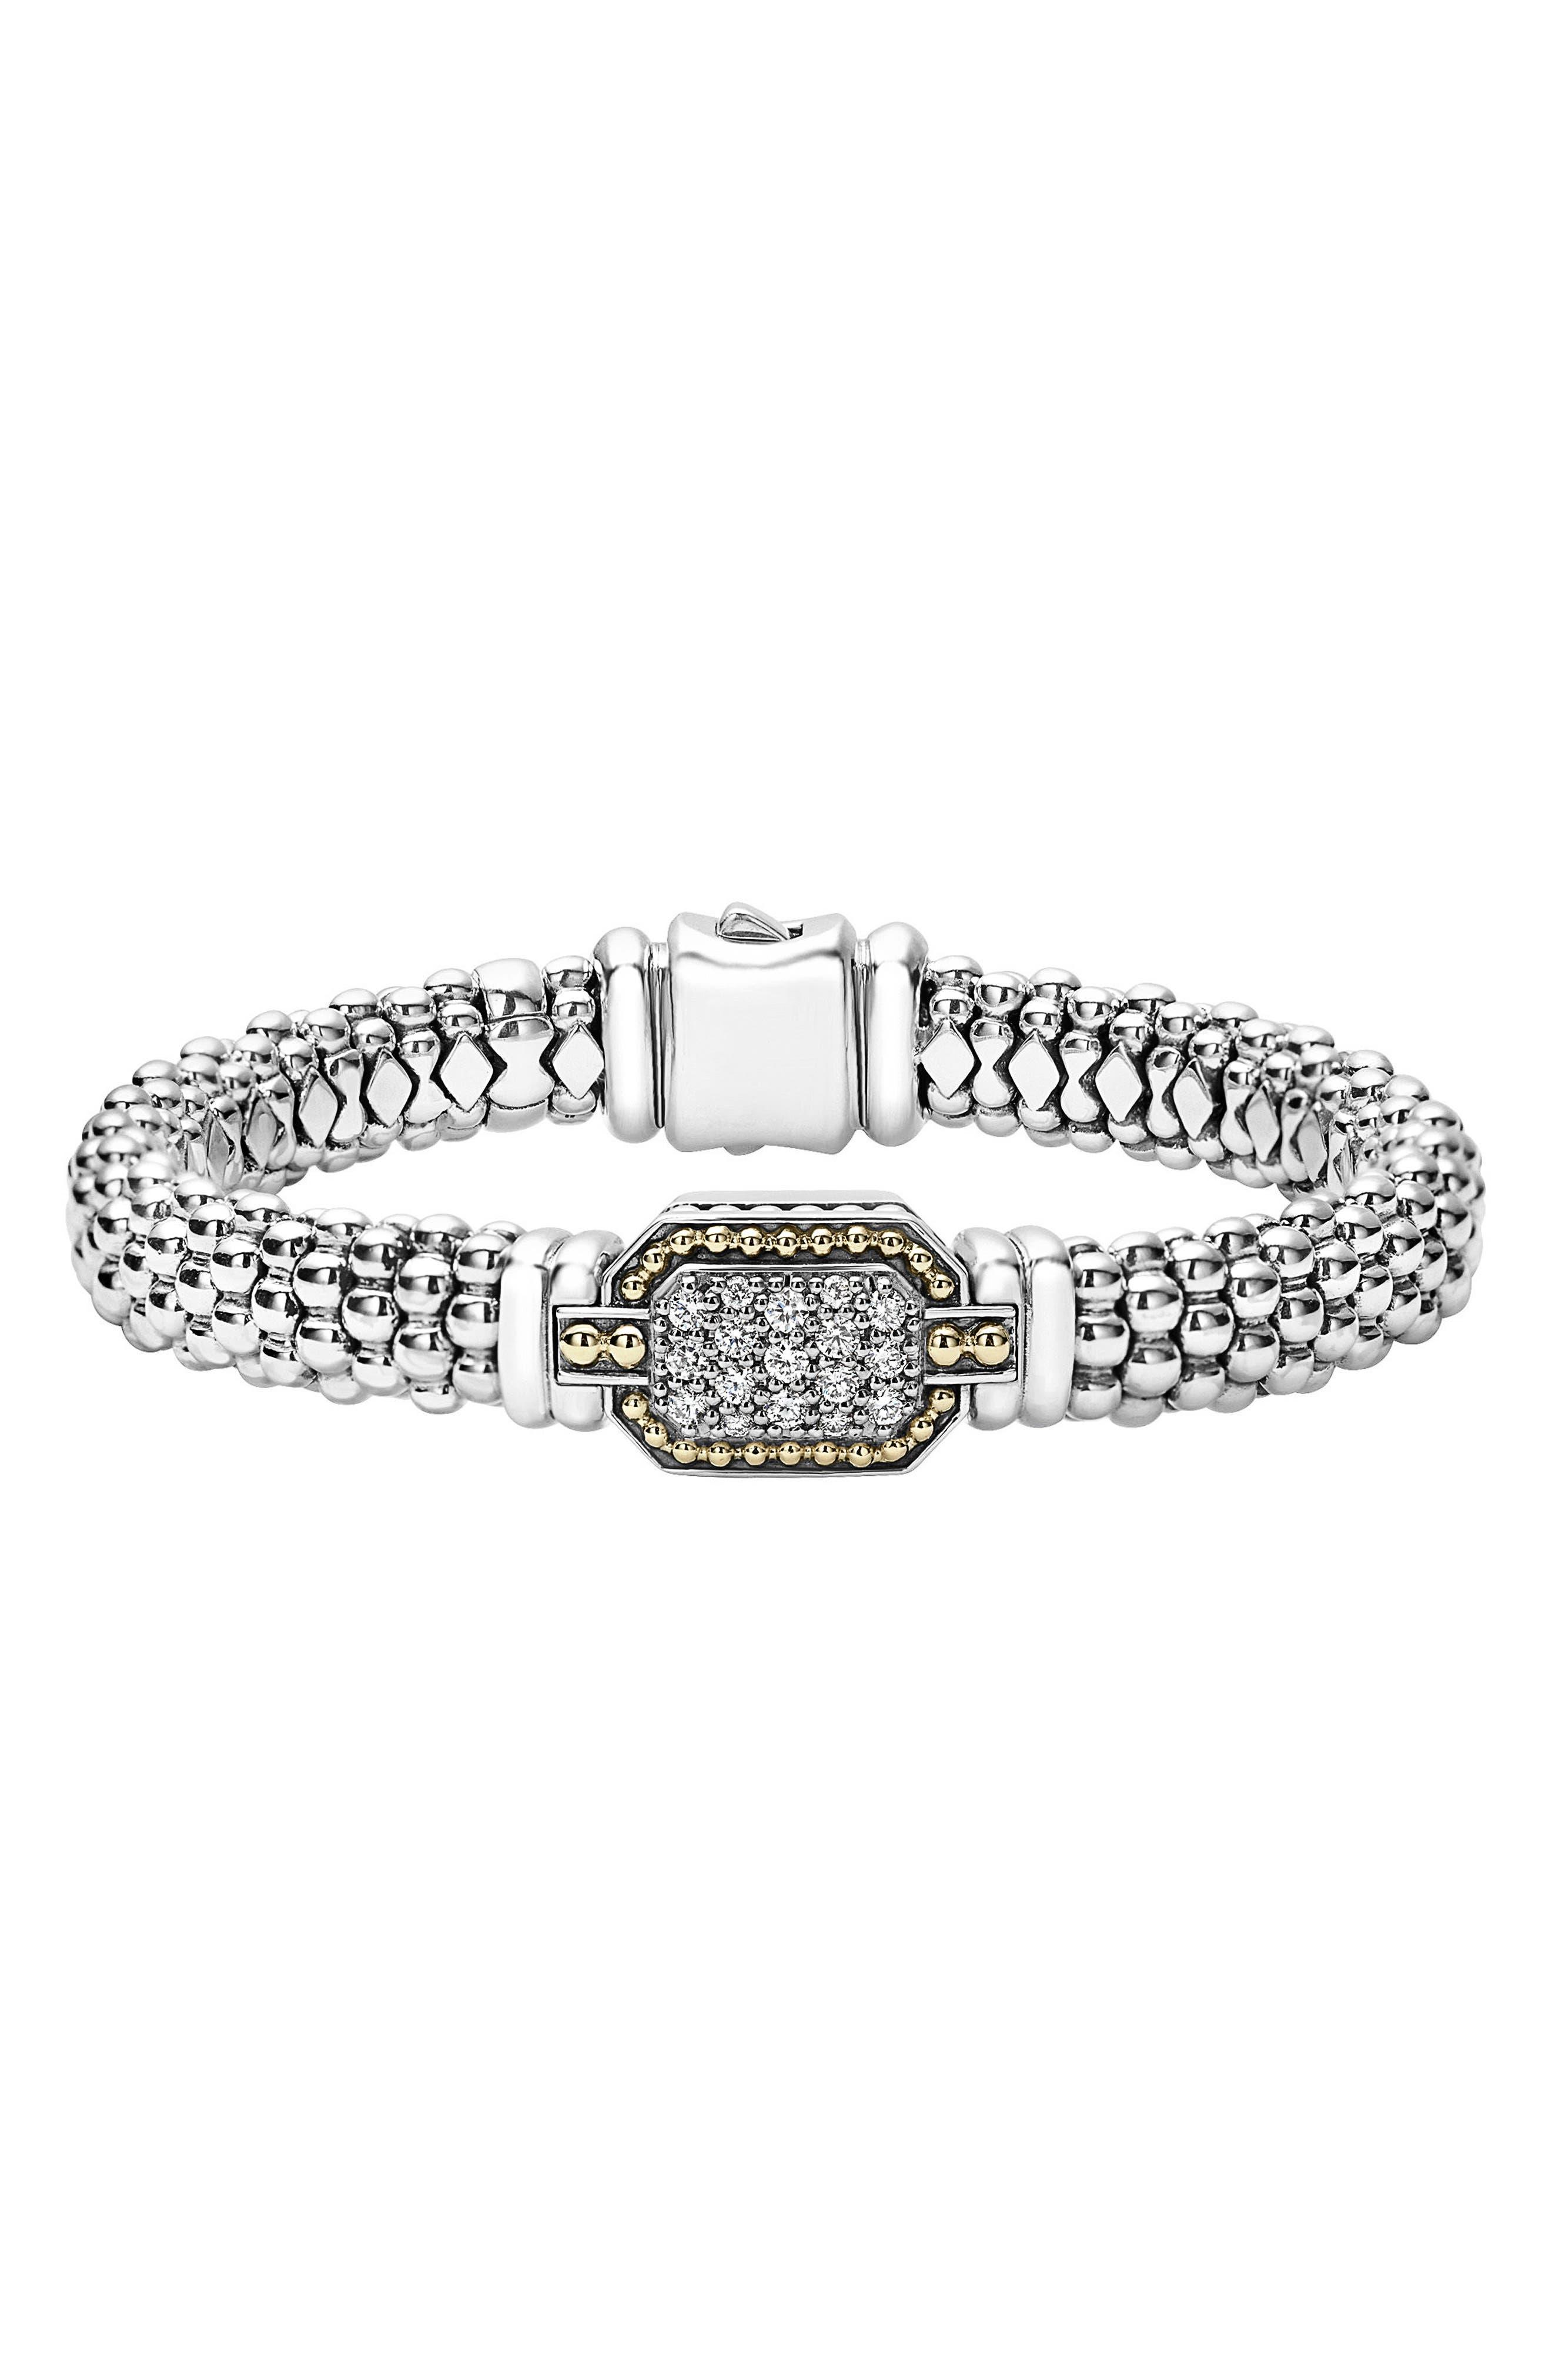 Diamonds & Caviar Large Diamond Bracelet,                             Main thumbnail 1, color,                             Silver